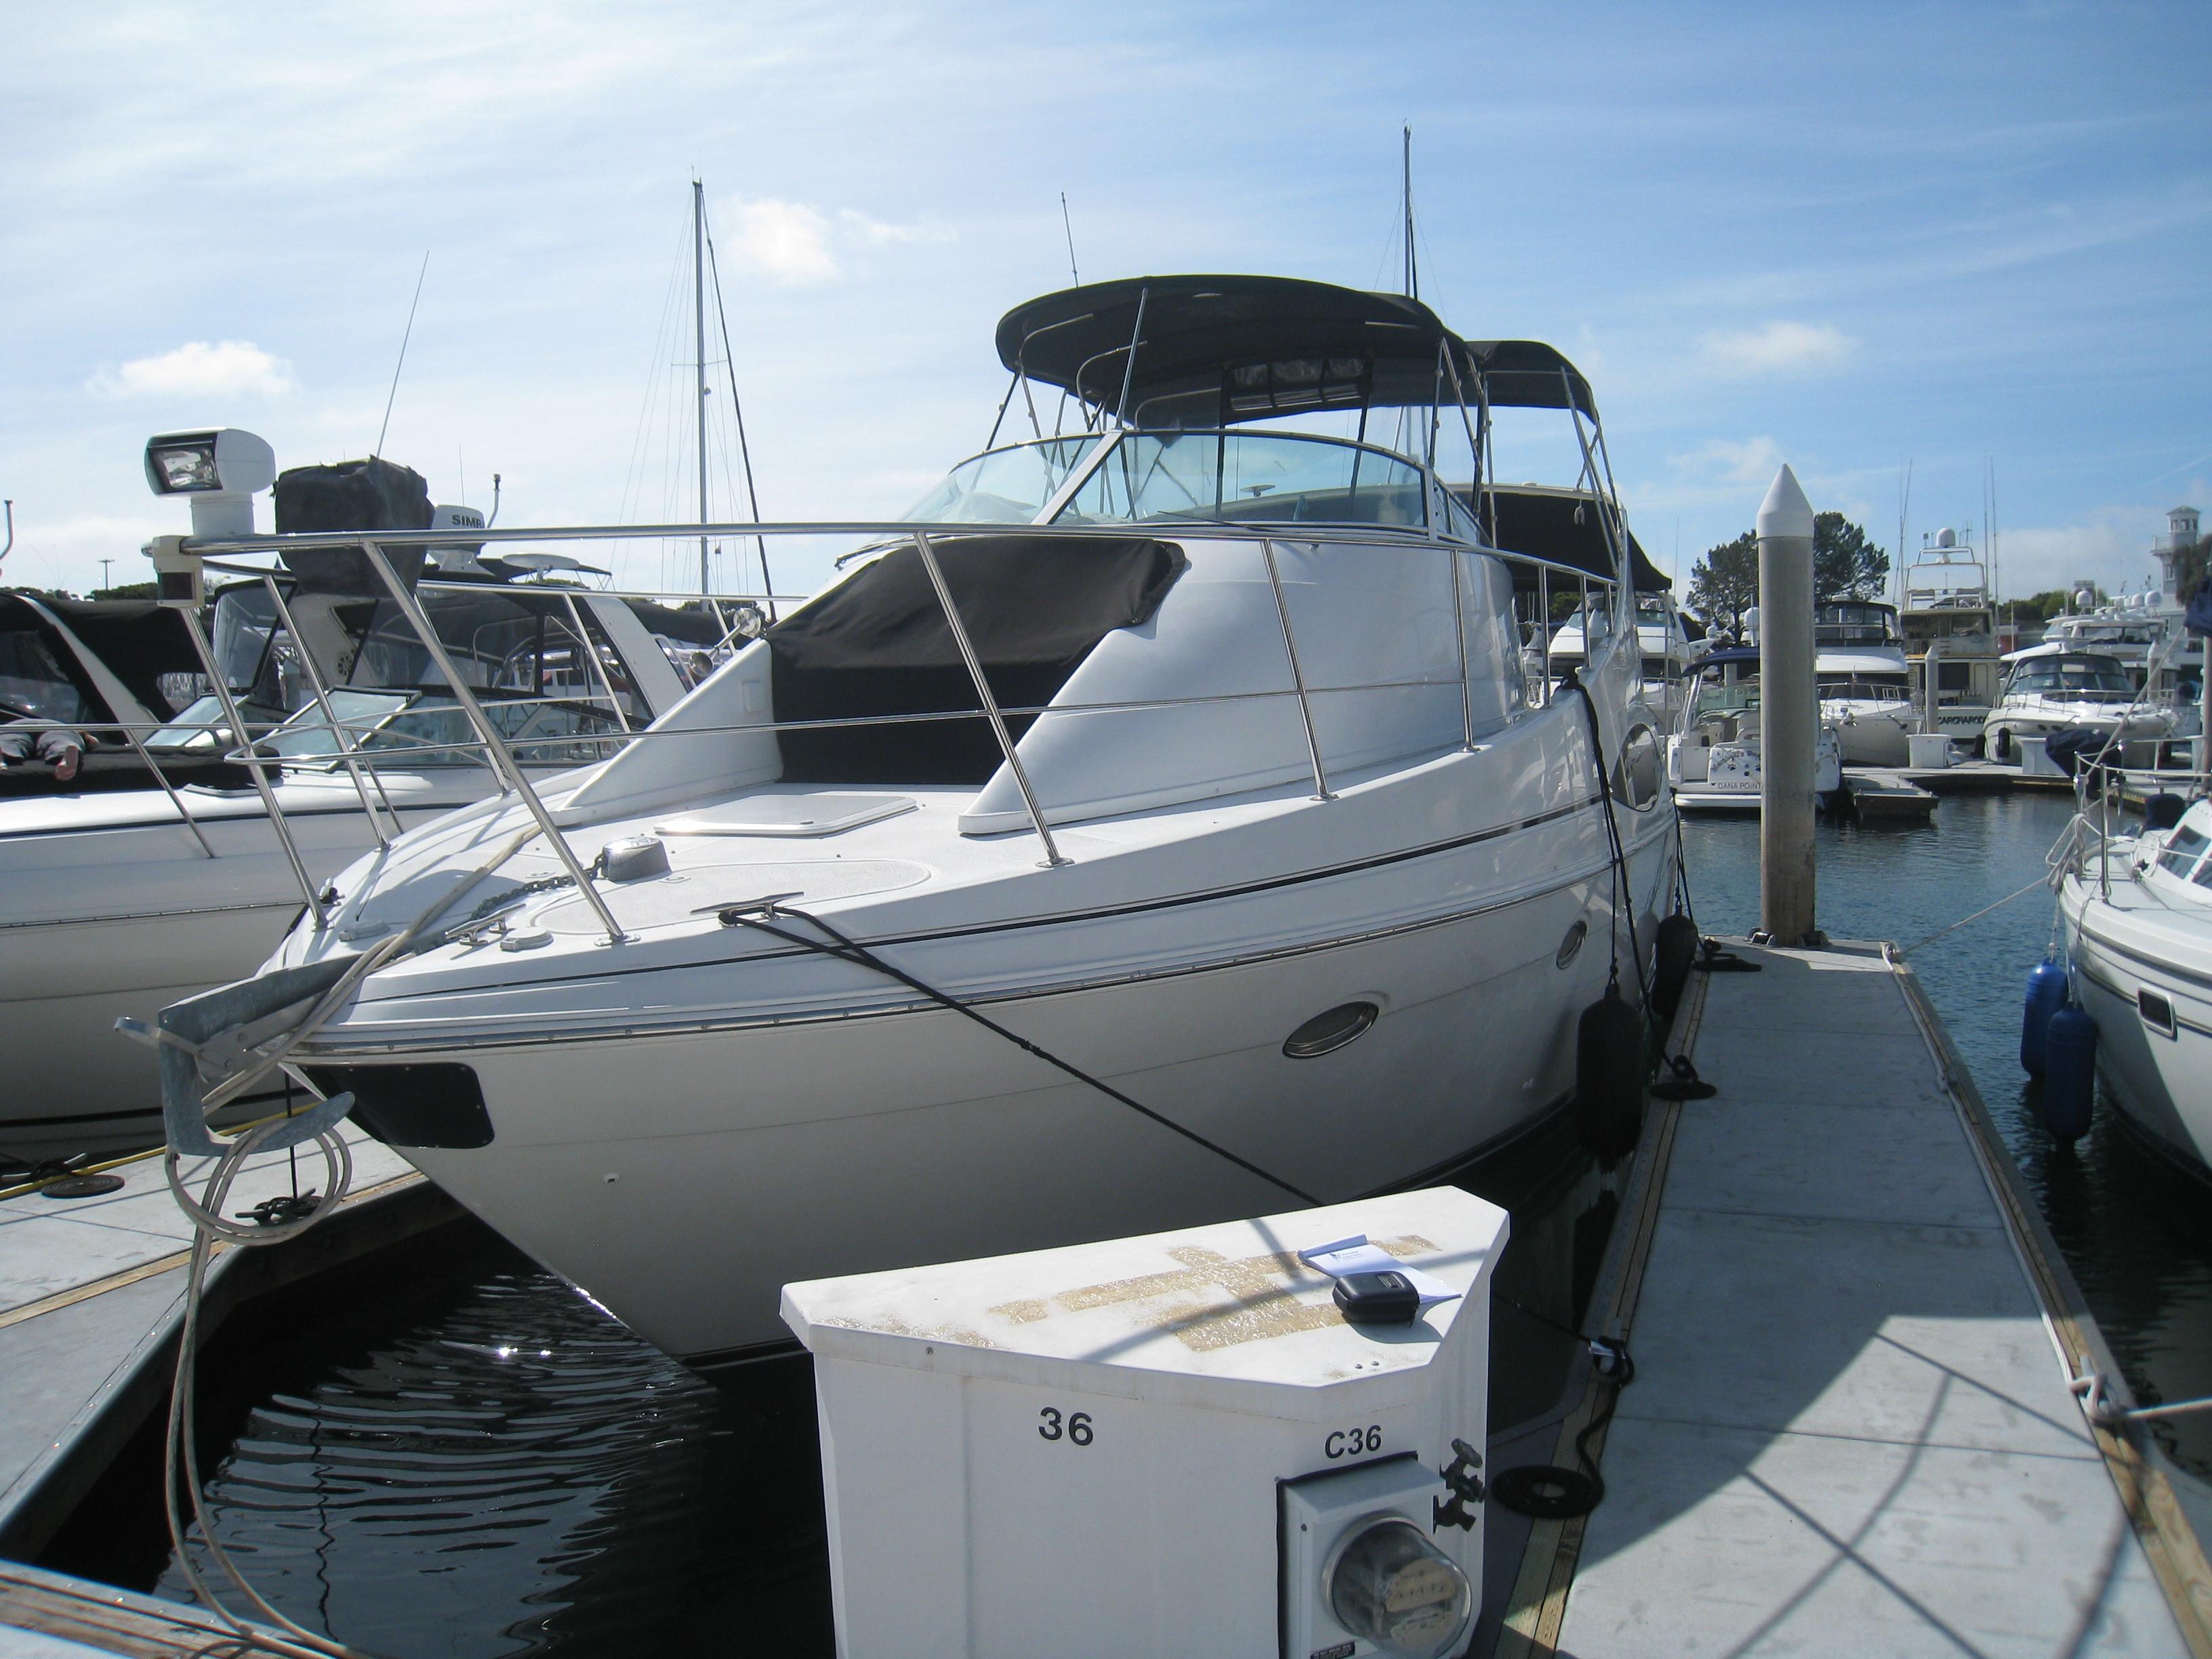 350 Mariner - 50 North